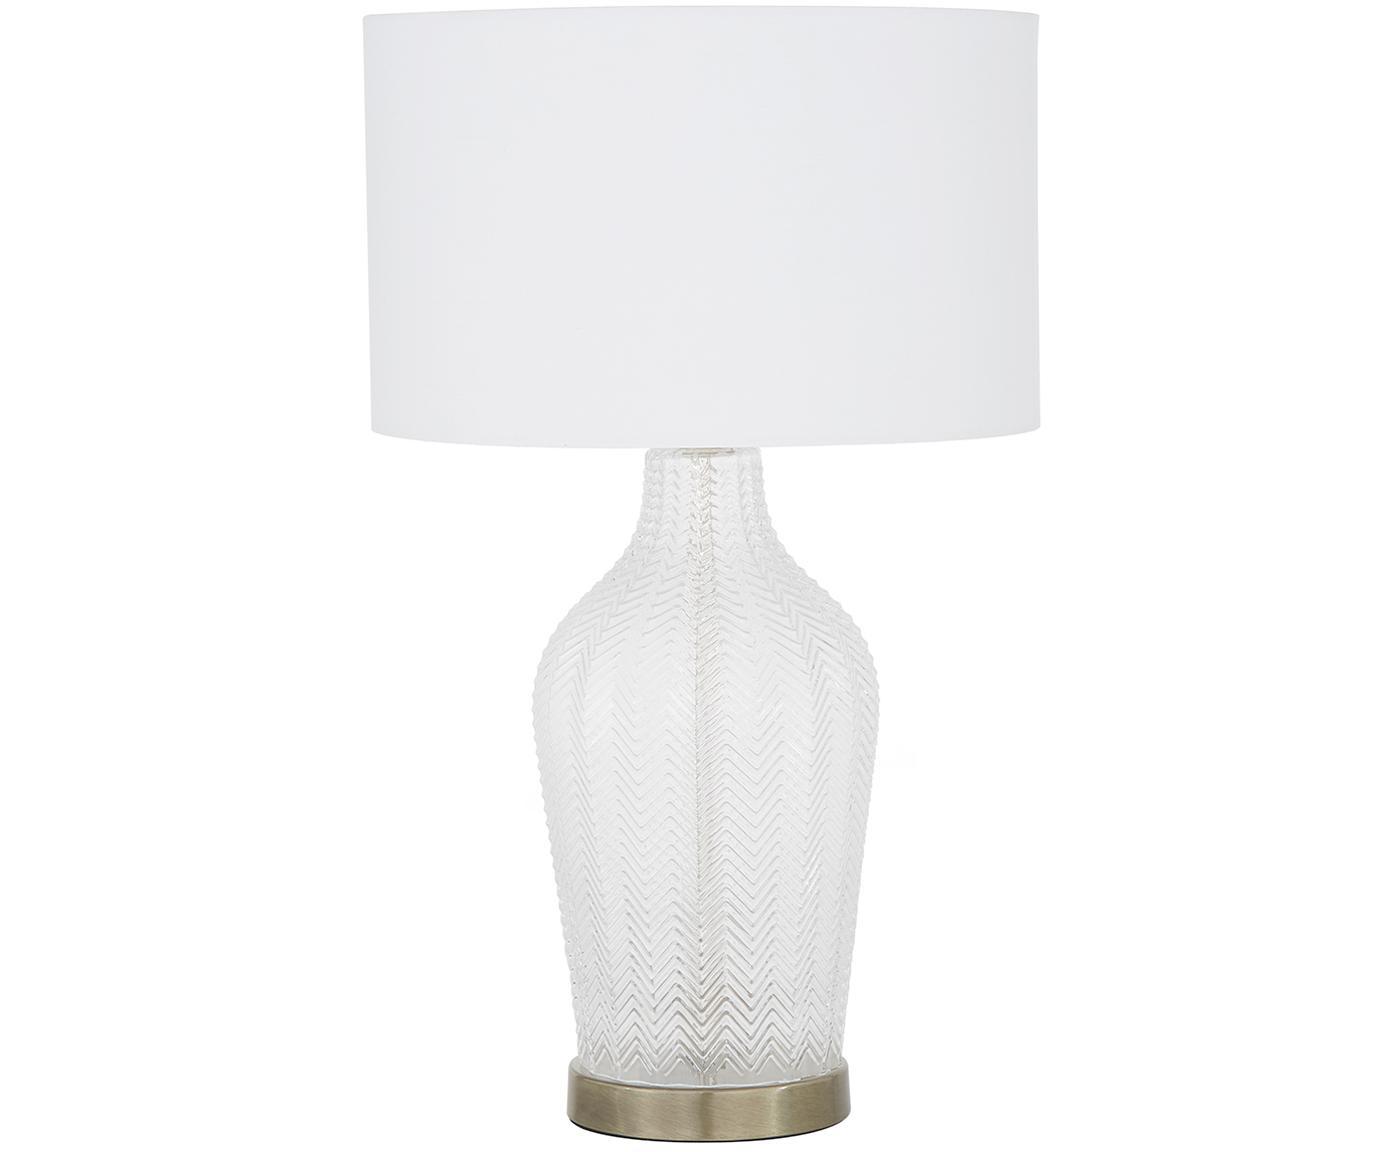 Tafellamp Sue, Lampenkap: textiel, Lampvoet: glas, vermessingd metaal, Lampenkap: wit lampvoet: transparant, geborsteld messing, Ø 33 x H 55 cm